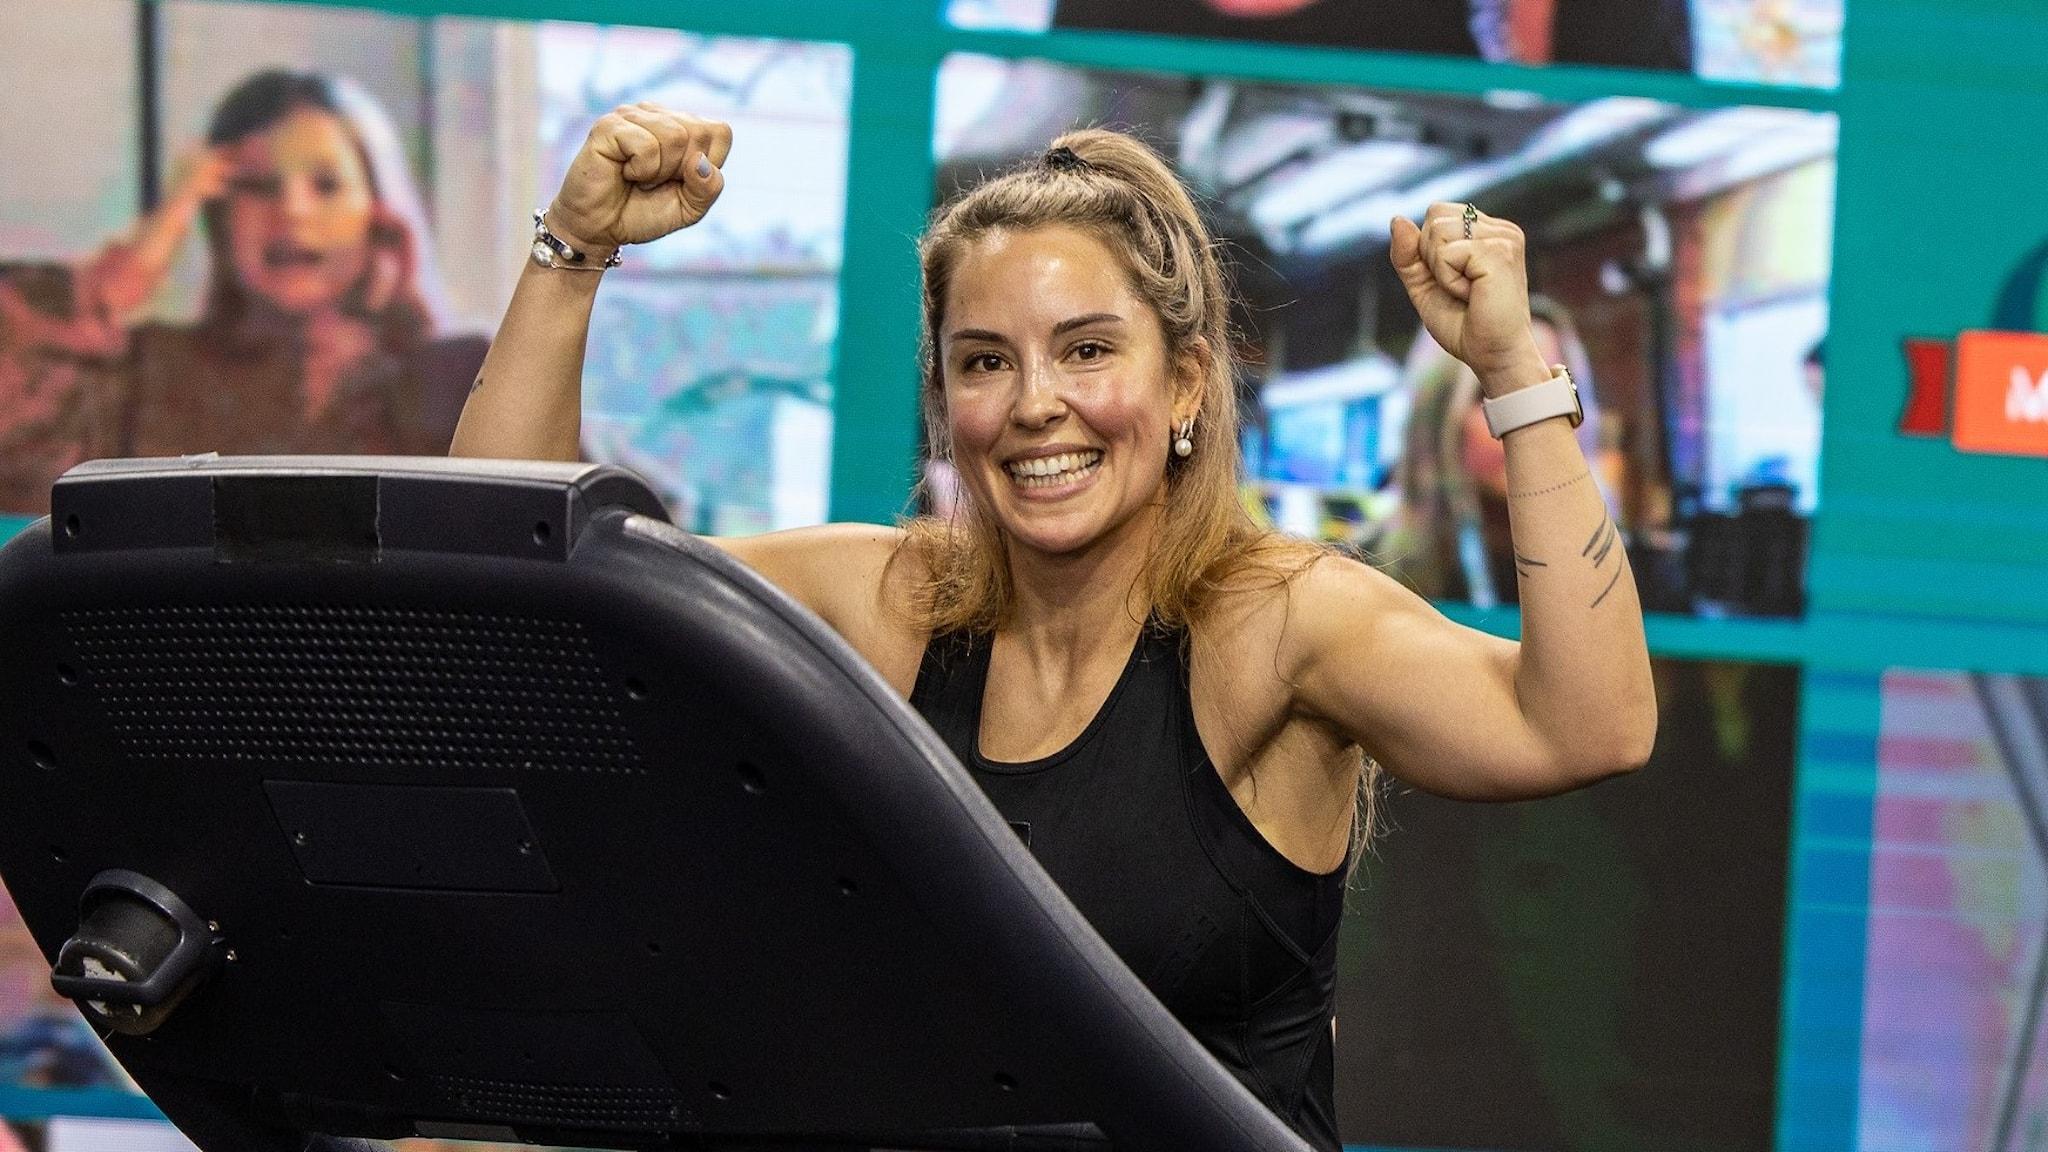 Alexandra Pizzoni bestiger Mount Everest på löpband i Musikhjälpen